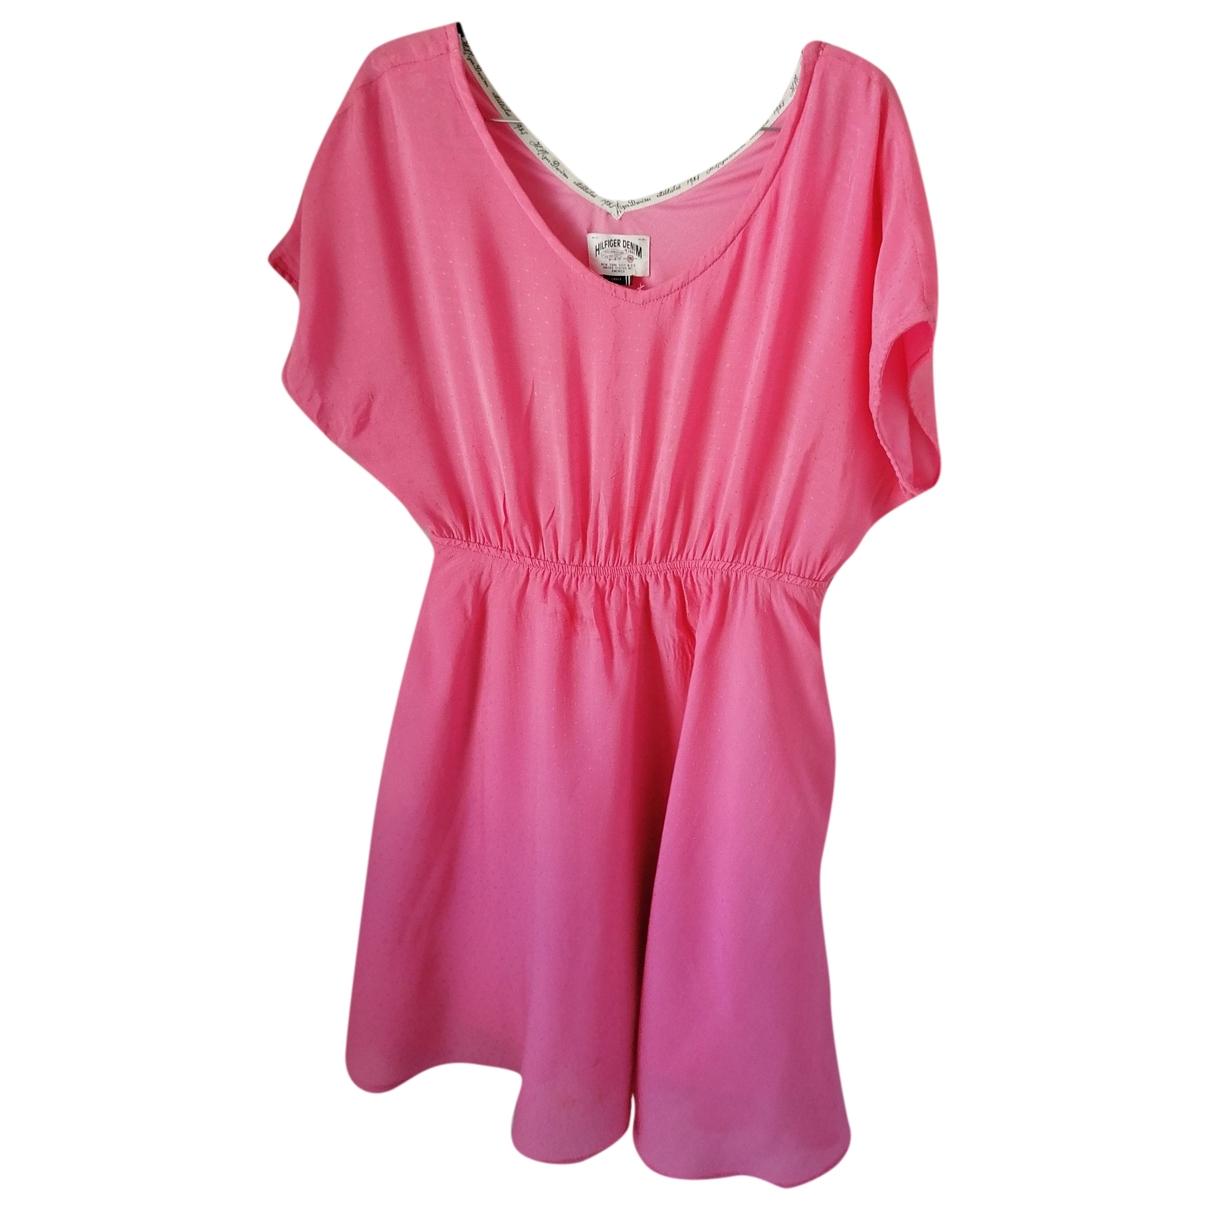 Tommy Hilfiger \N Pink Cotton dress for Women XS International